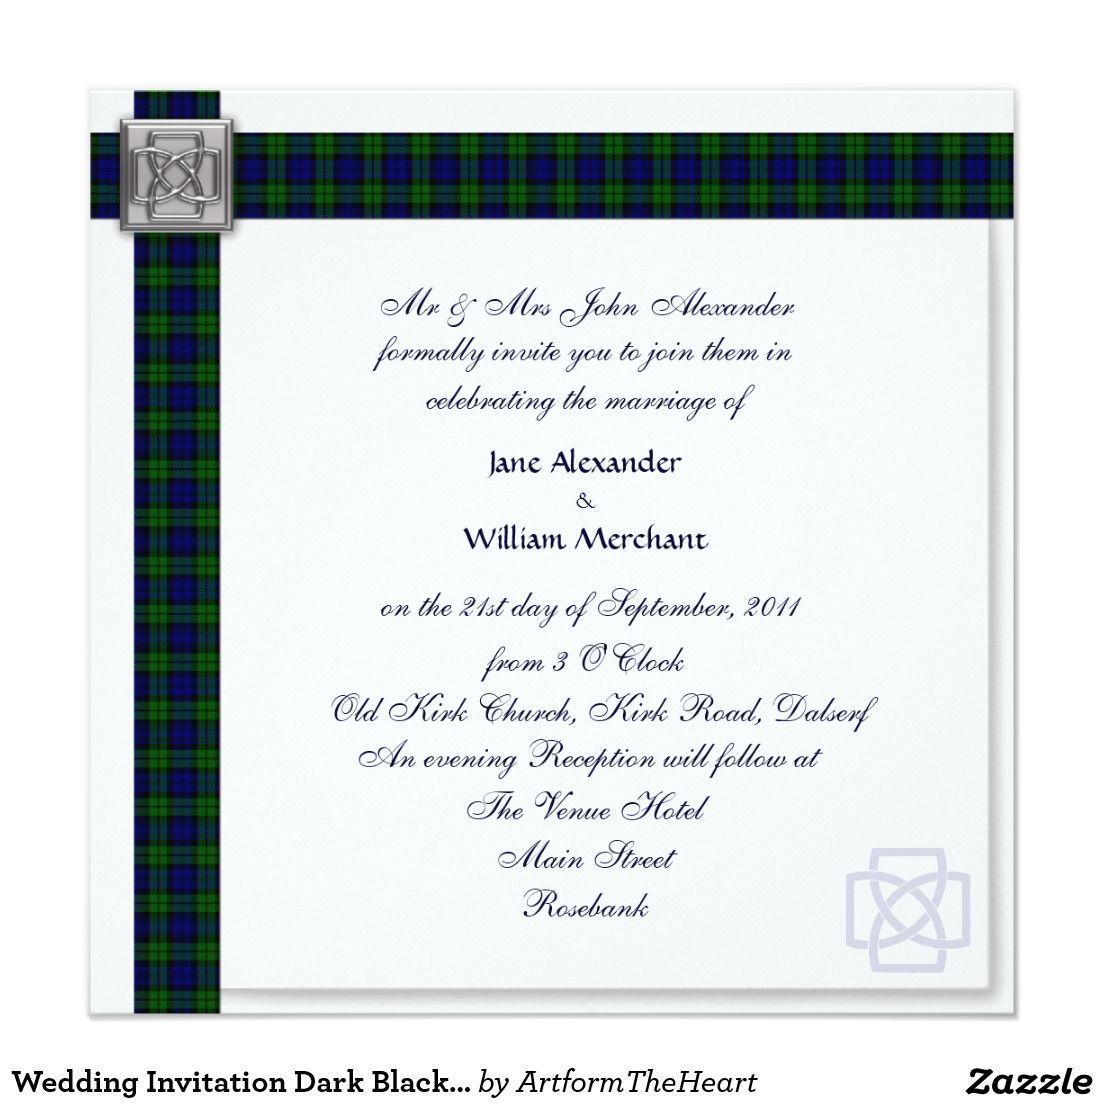 Wedding Invitation Dark Black Watch Tartan | TARTAN WEDDING ...